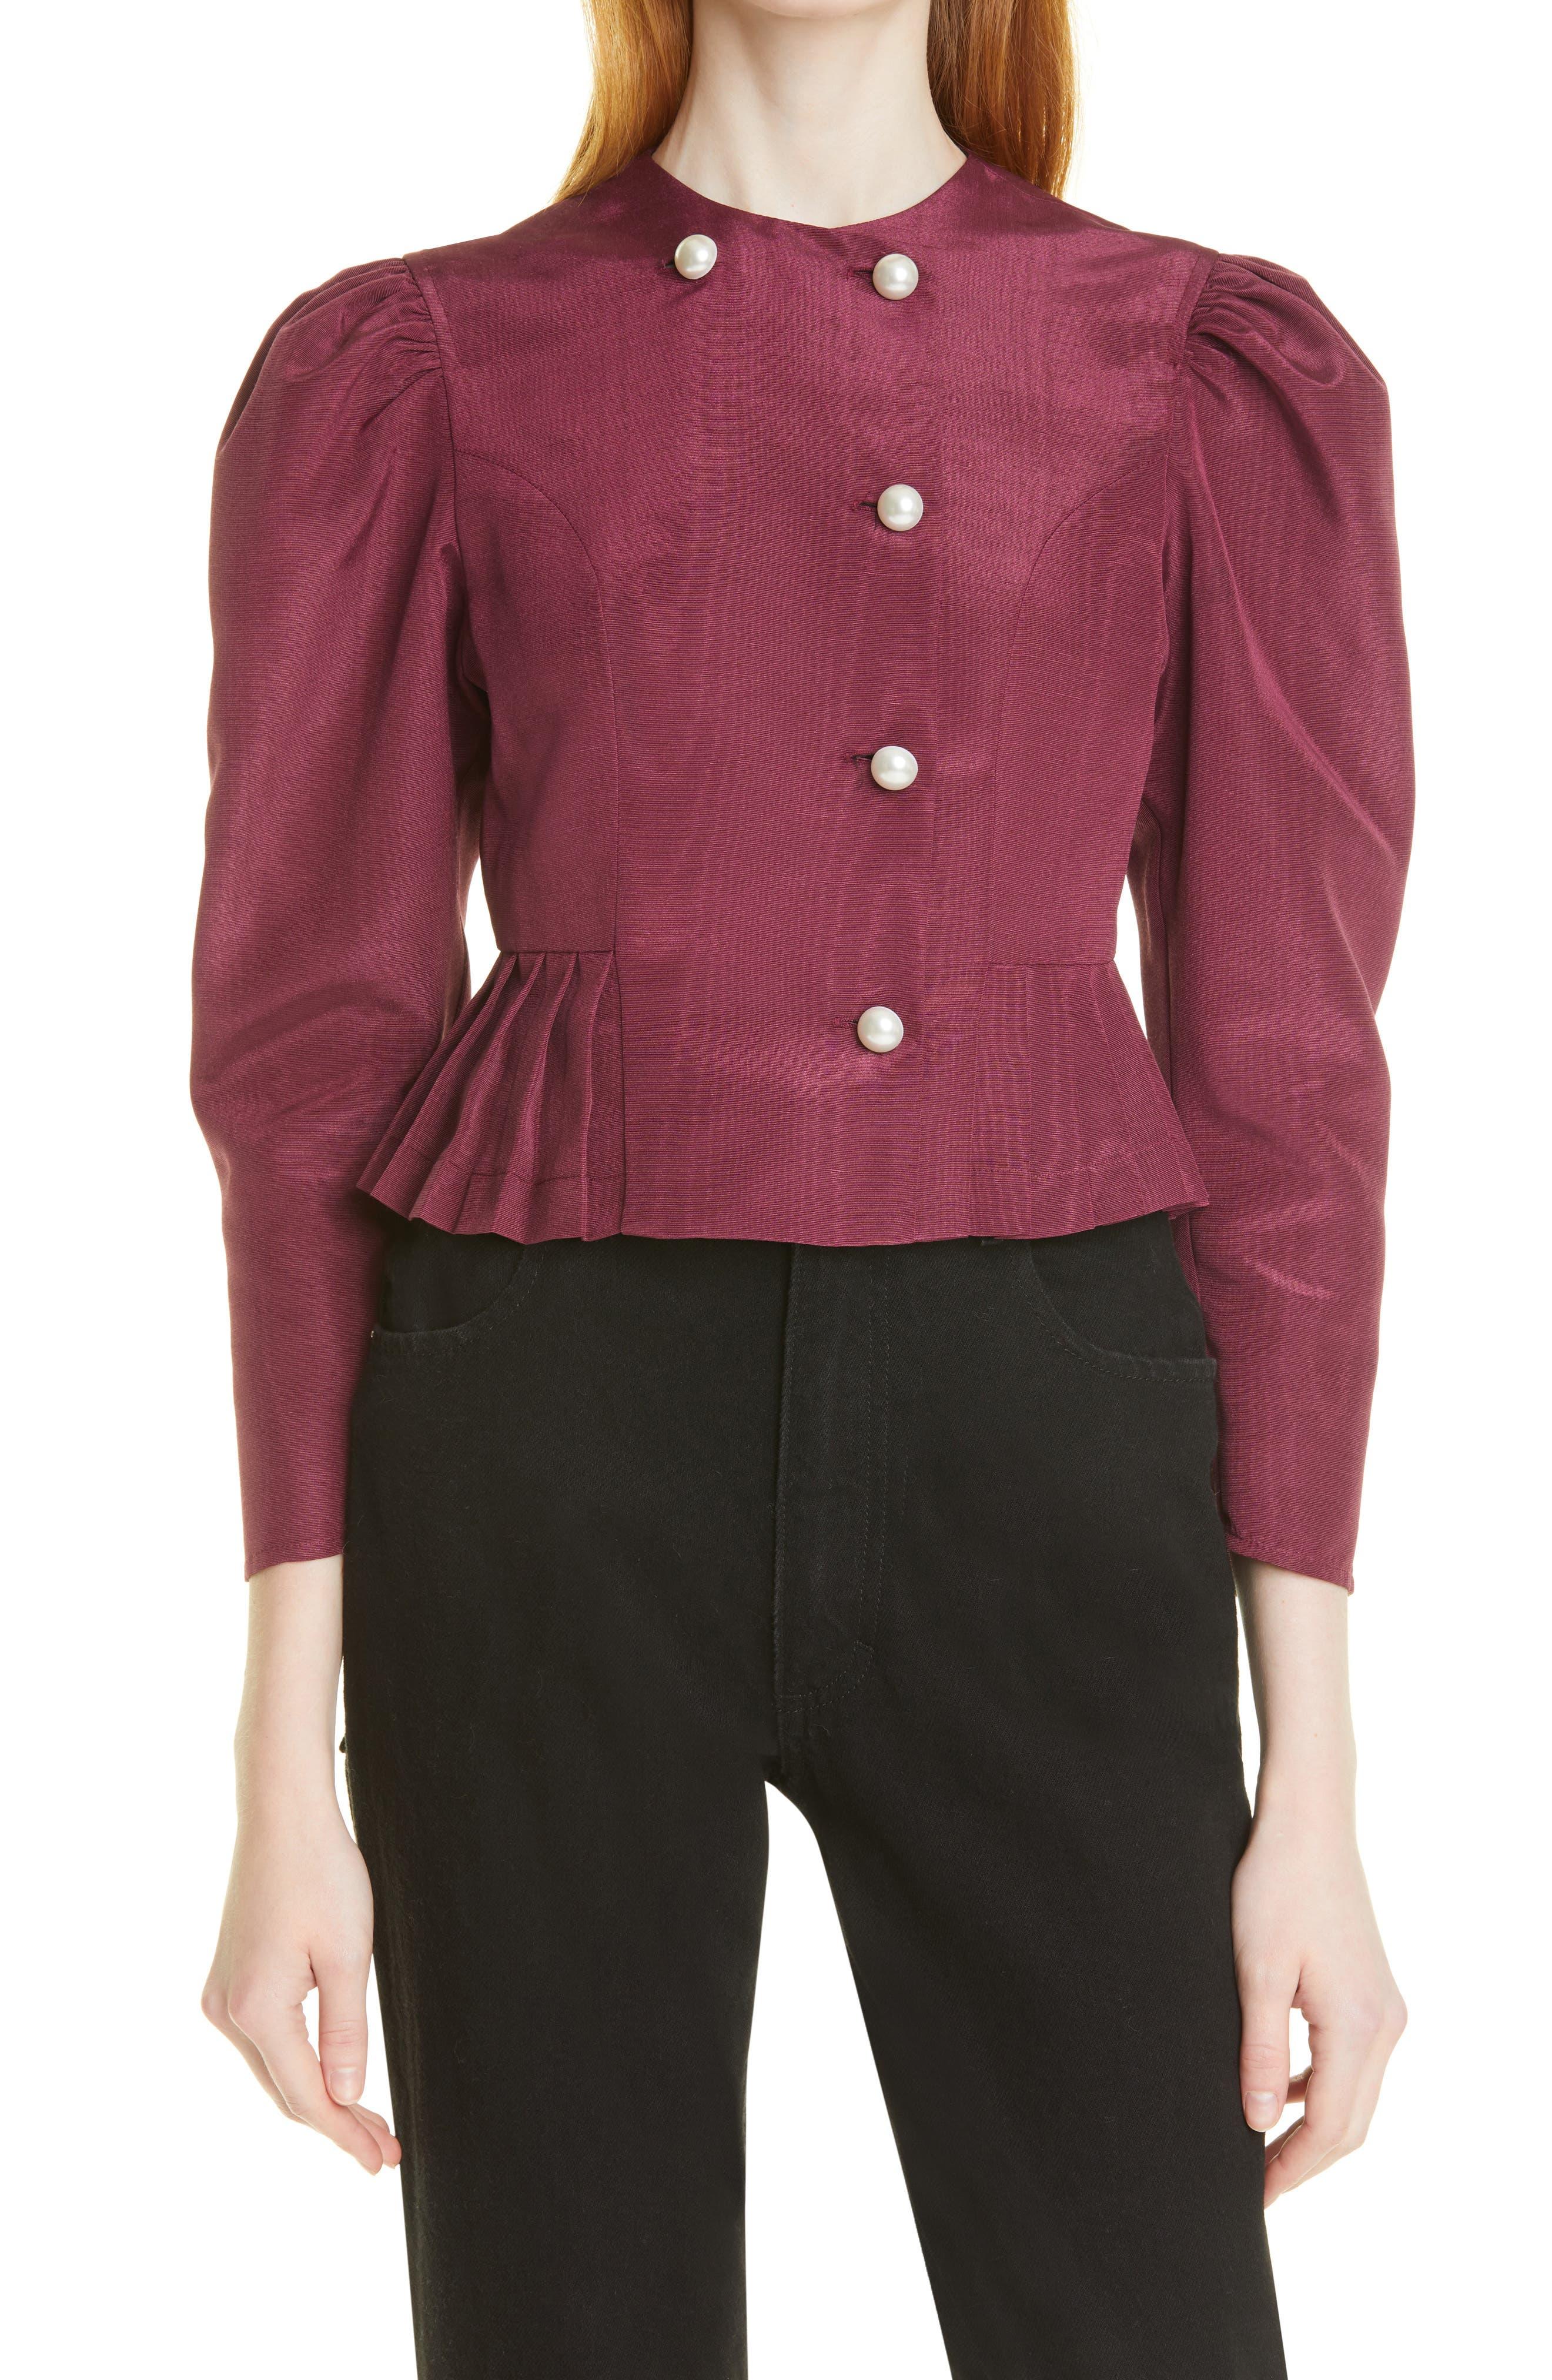 Kat Three-Quarter Sleeve Jacket